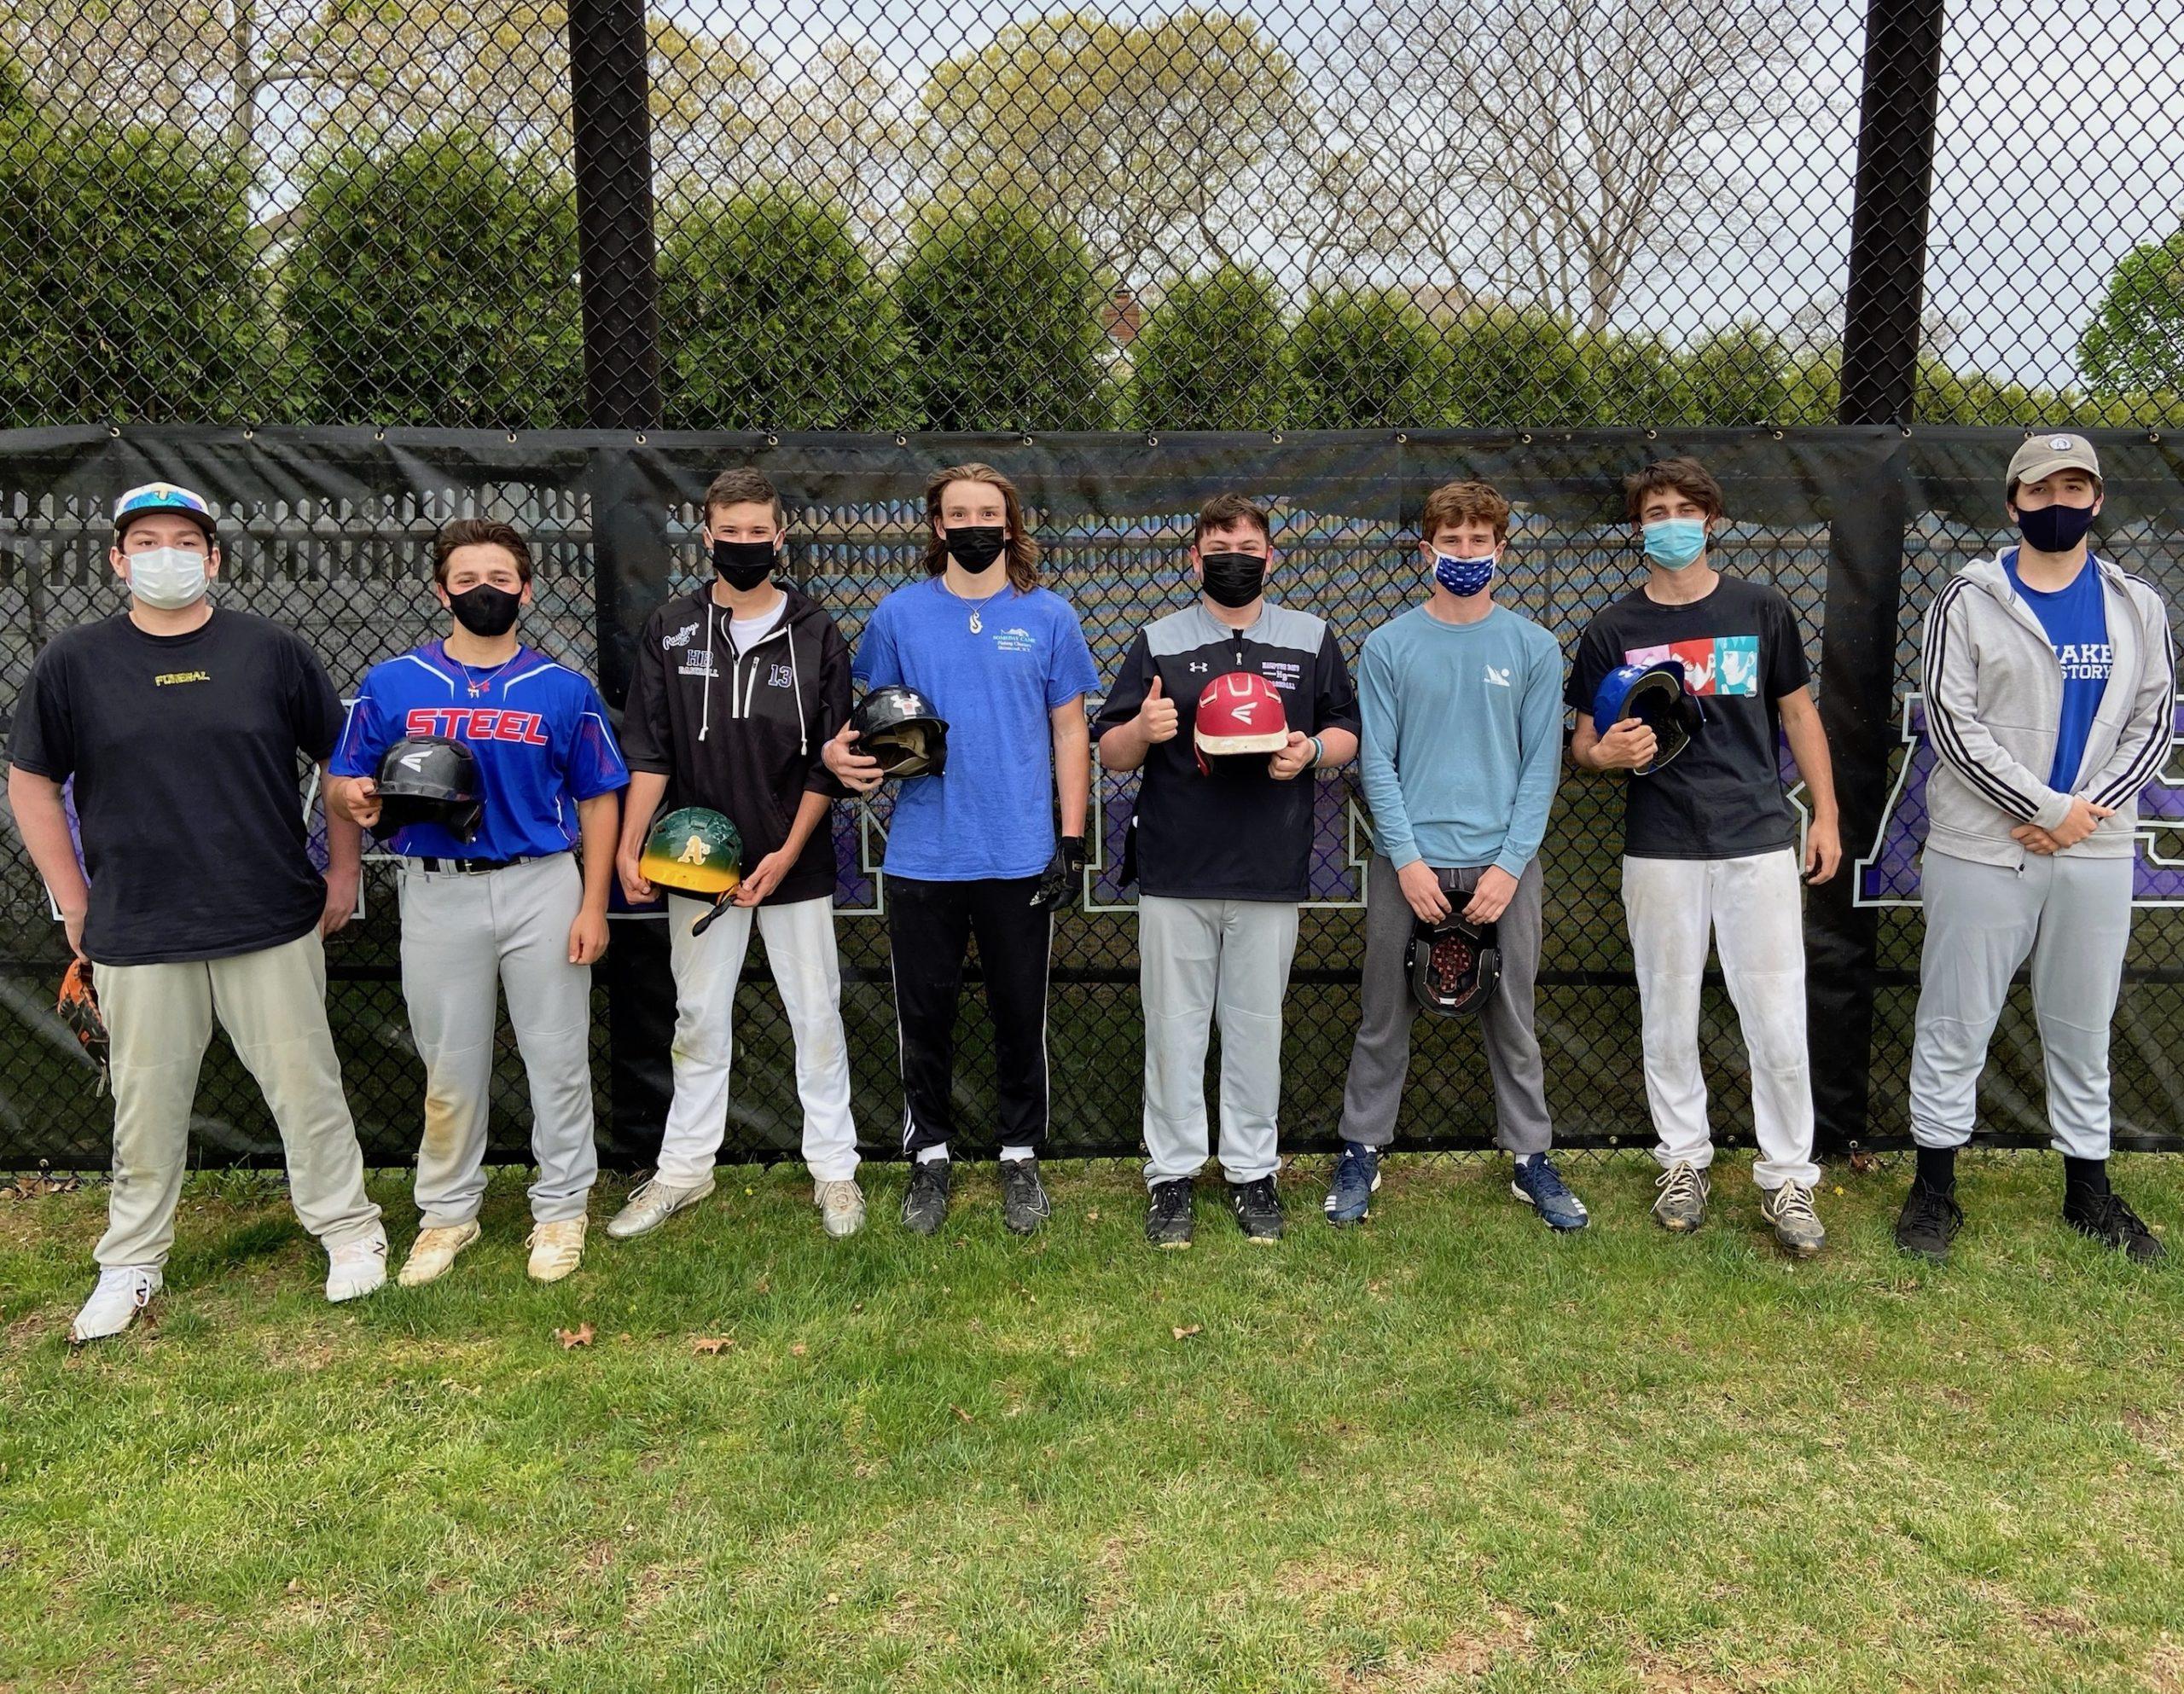 Hampton Bays' baseball team boasts eight seniors this season — Paul Ryan, Jordan Adelson, David Catena, Mickey Bracken, Gus Schmidt, River Orlando, Kai Leporati and Reese Springer.